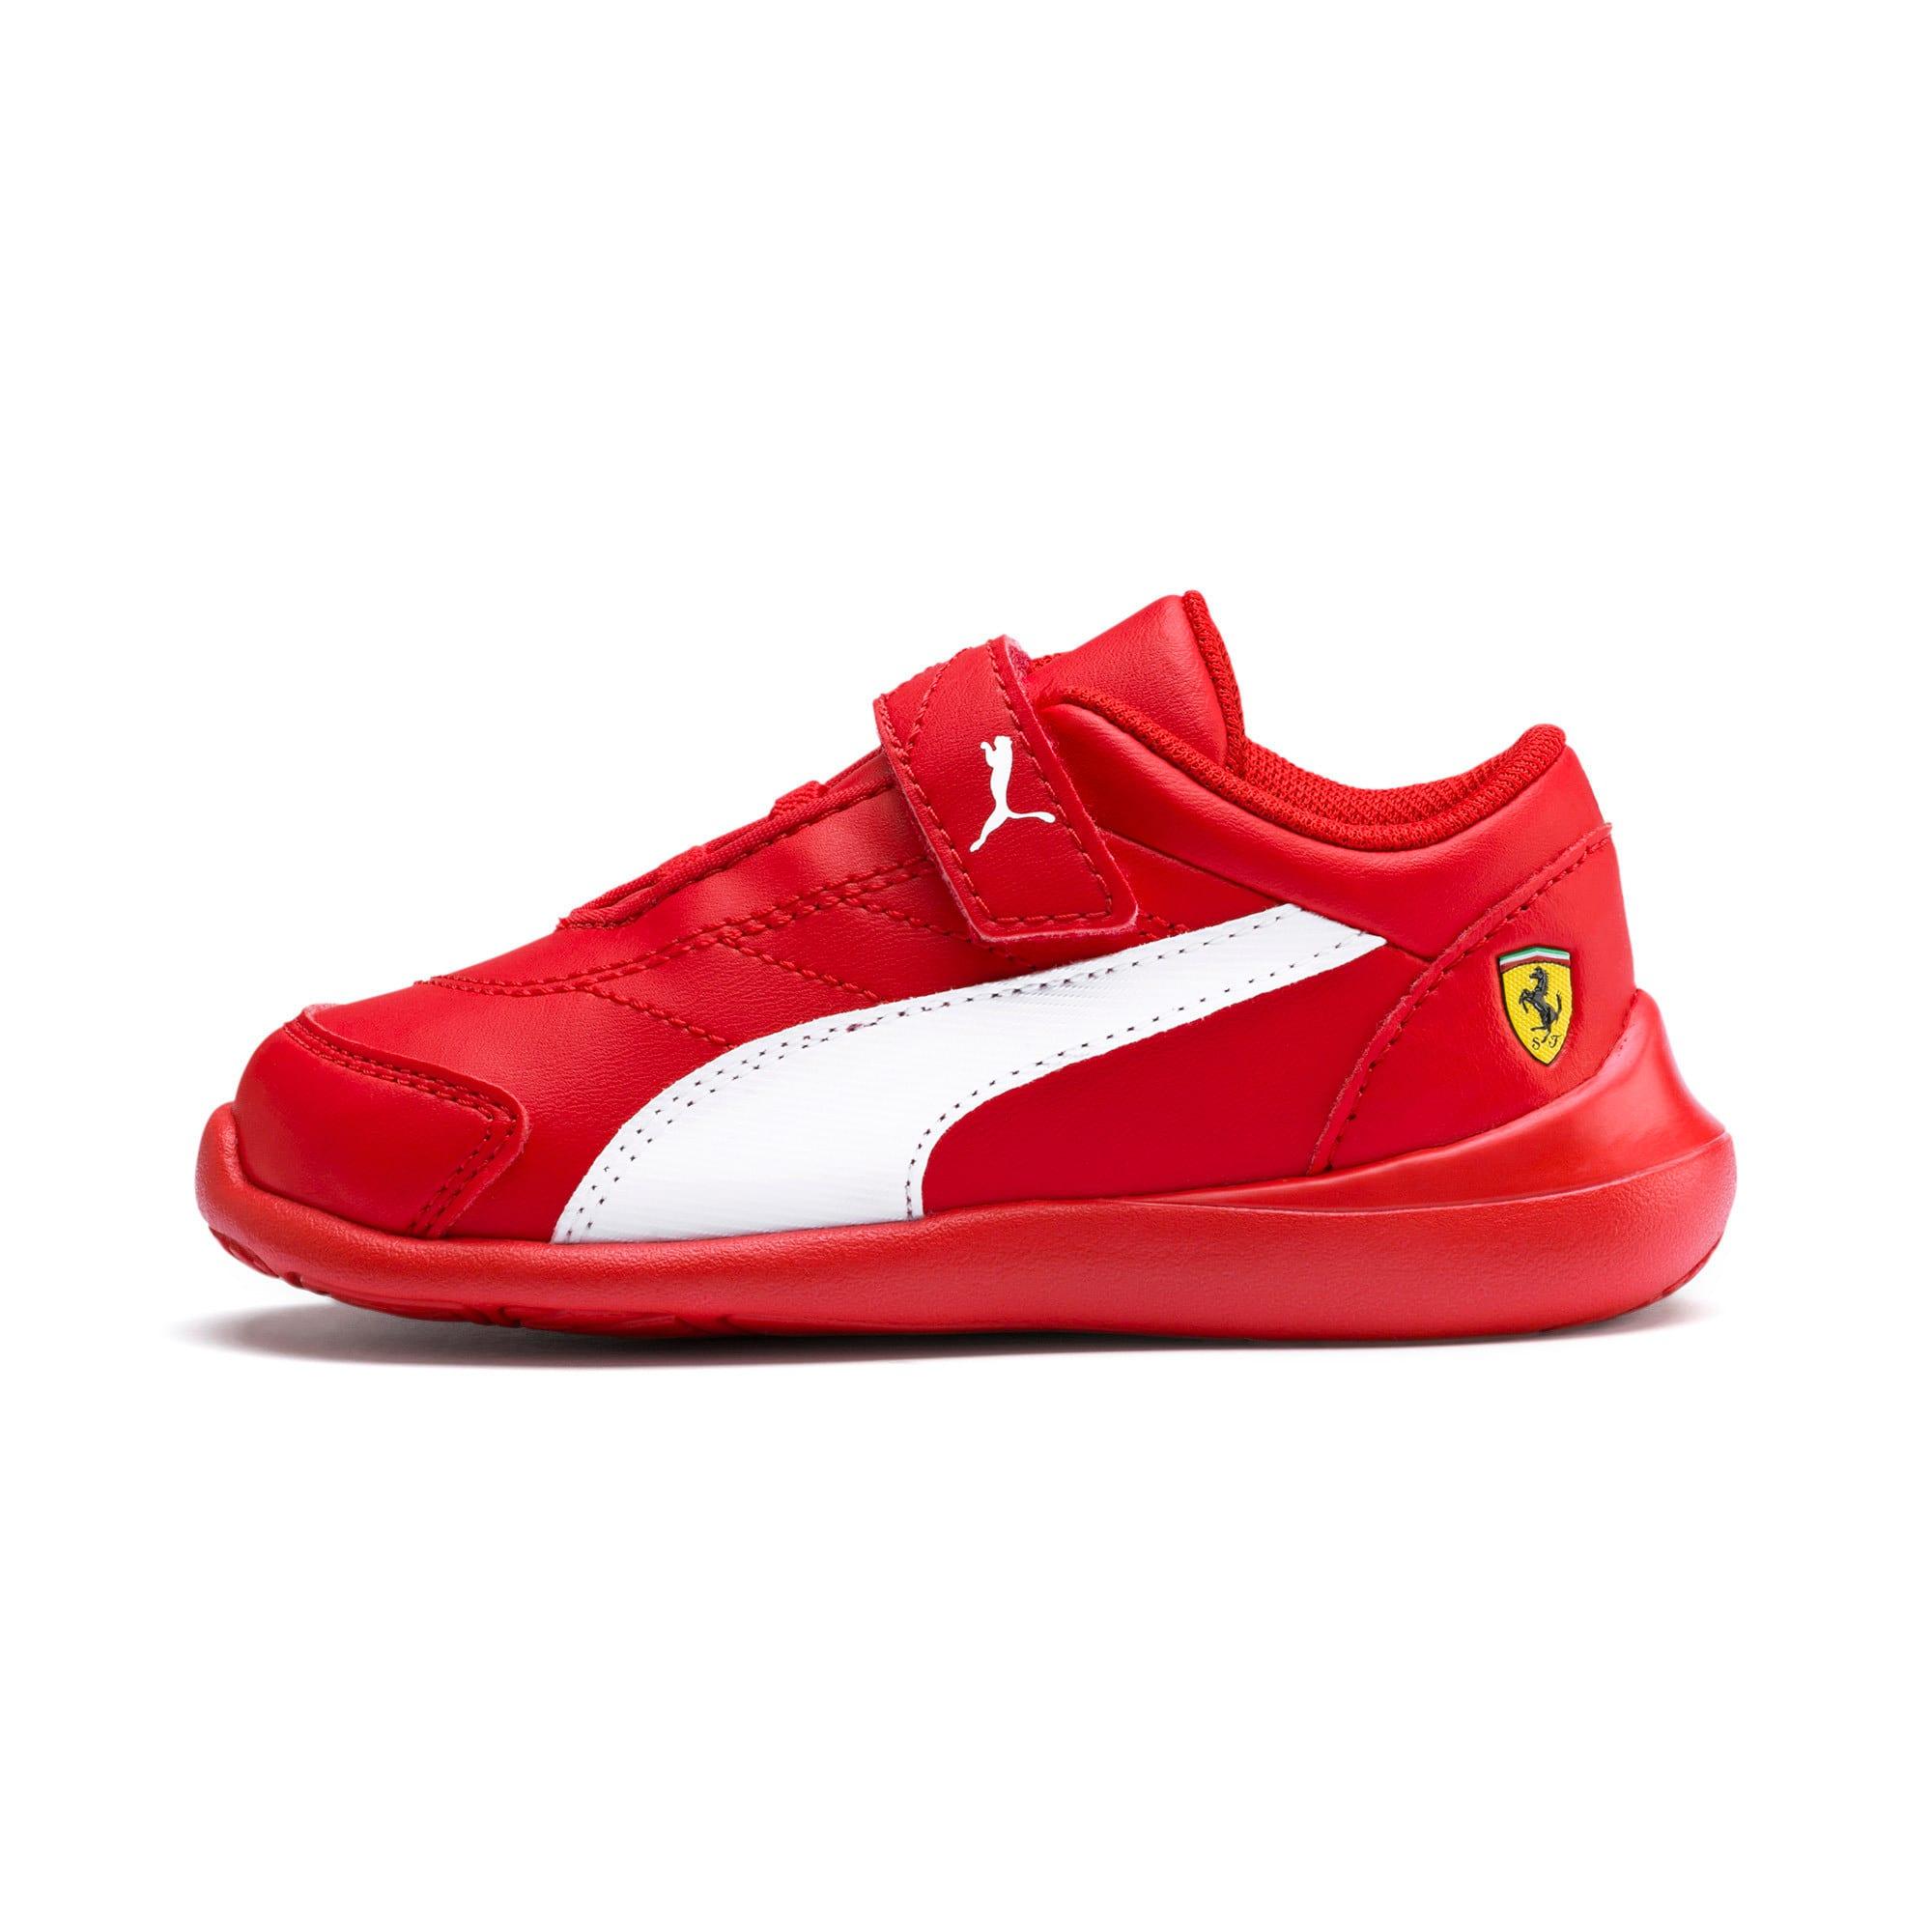 Miniatura 1 de Zapatos Scuderia Ferrari Kart Cat III para bebés, Rosso Corsa-Wht-Rosso Corsa, mediano